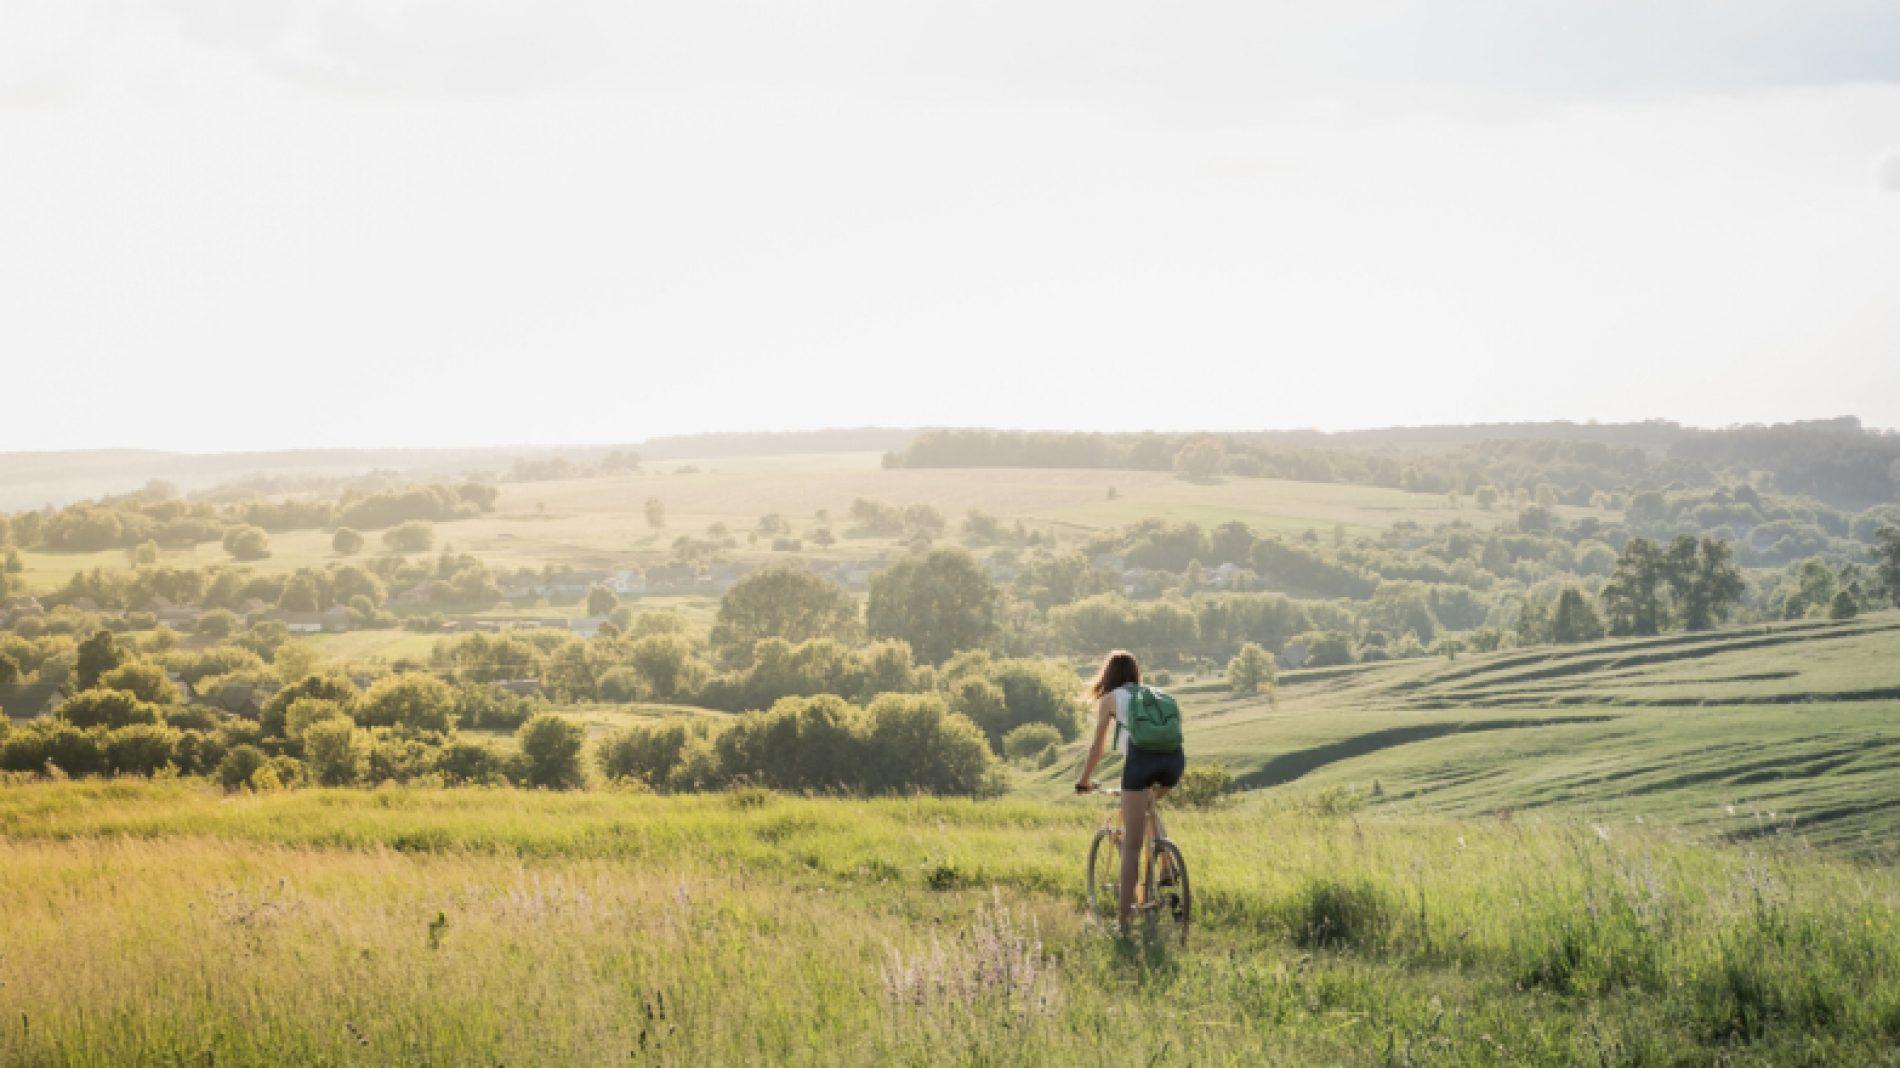 Young-woman-cycling-in-field-KJcaGl